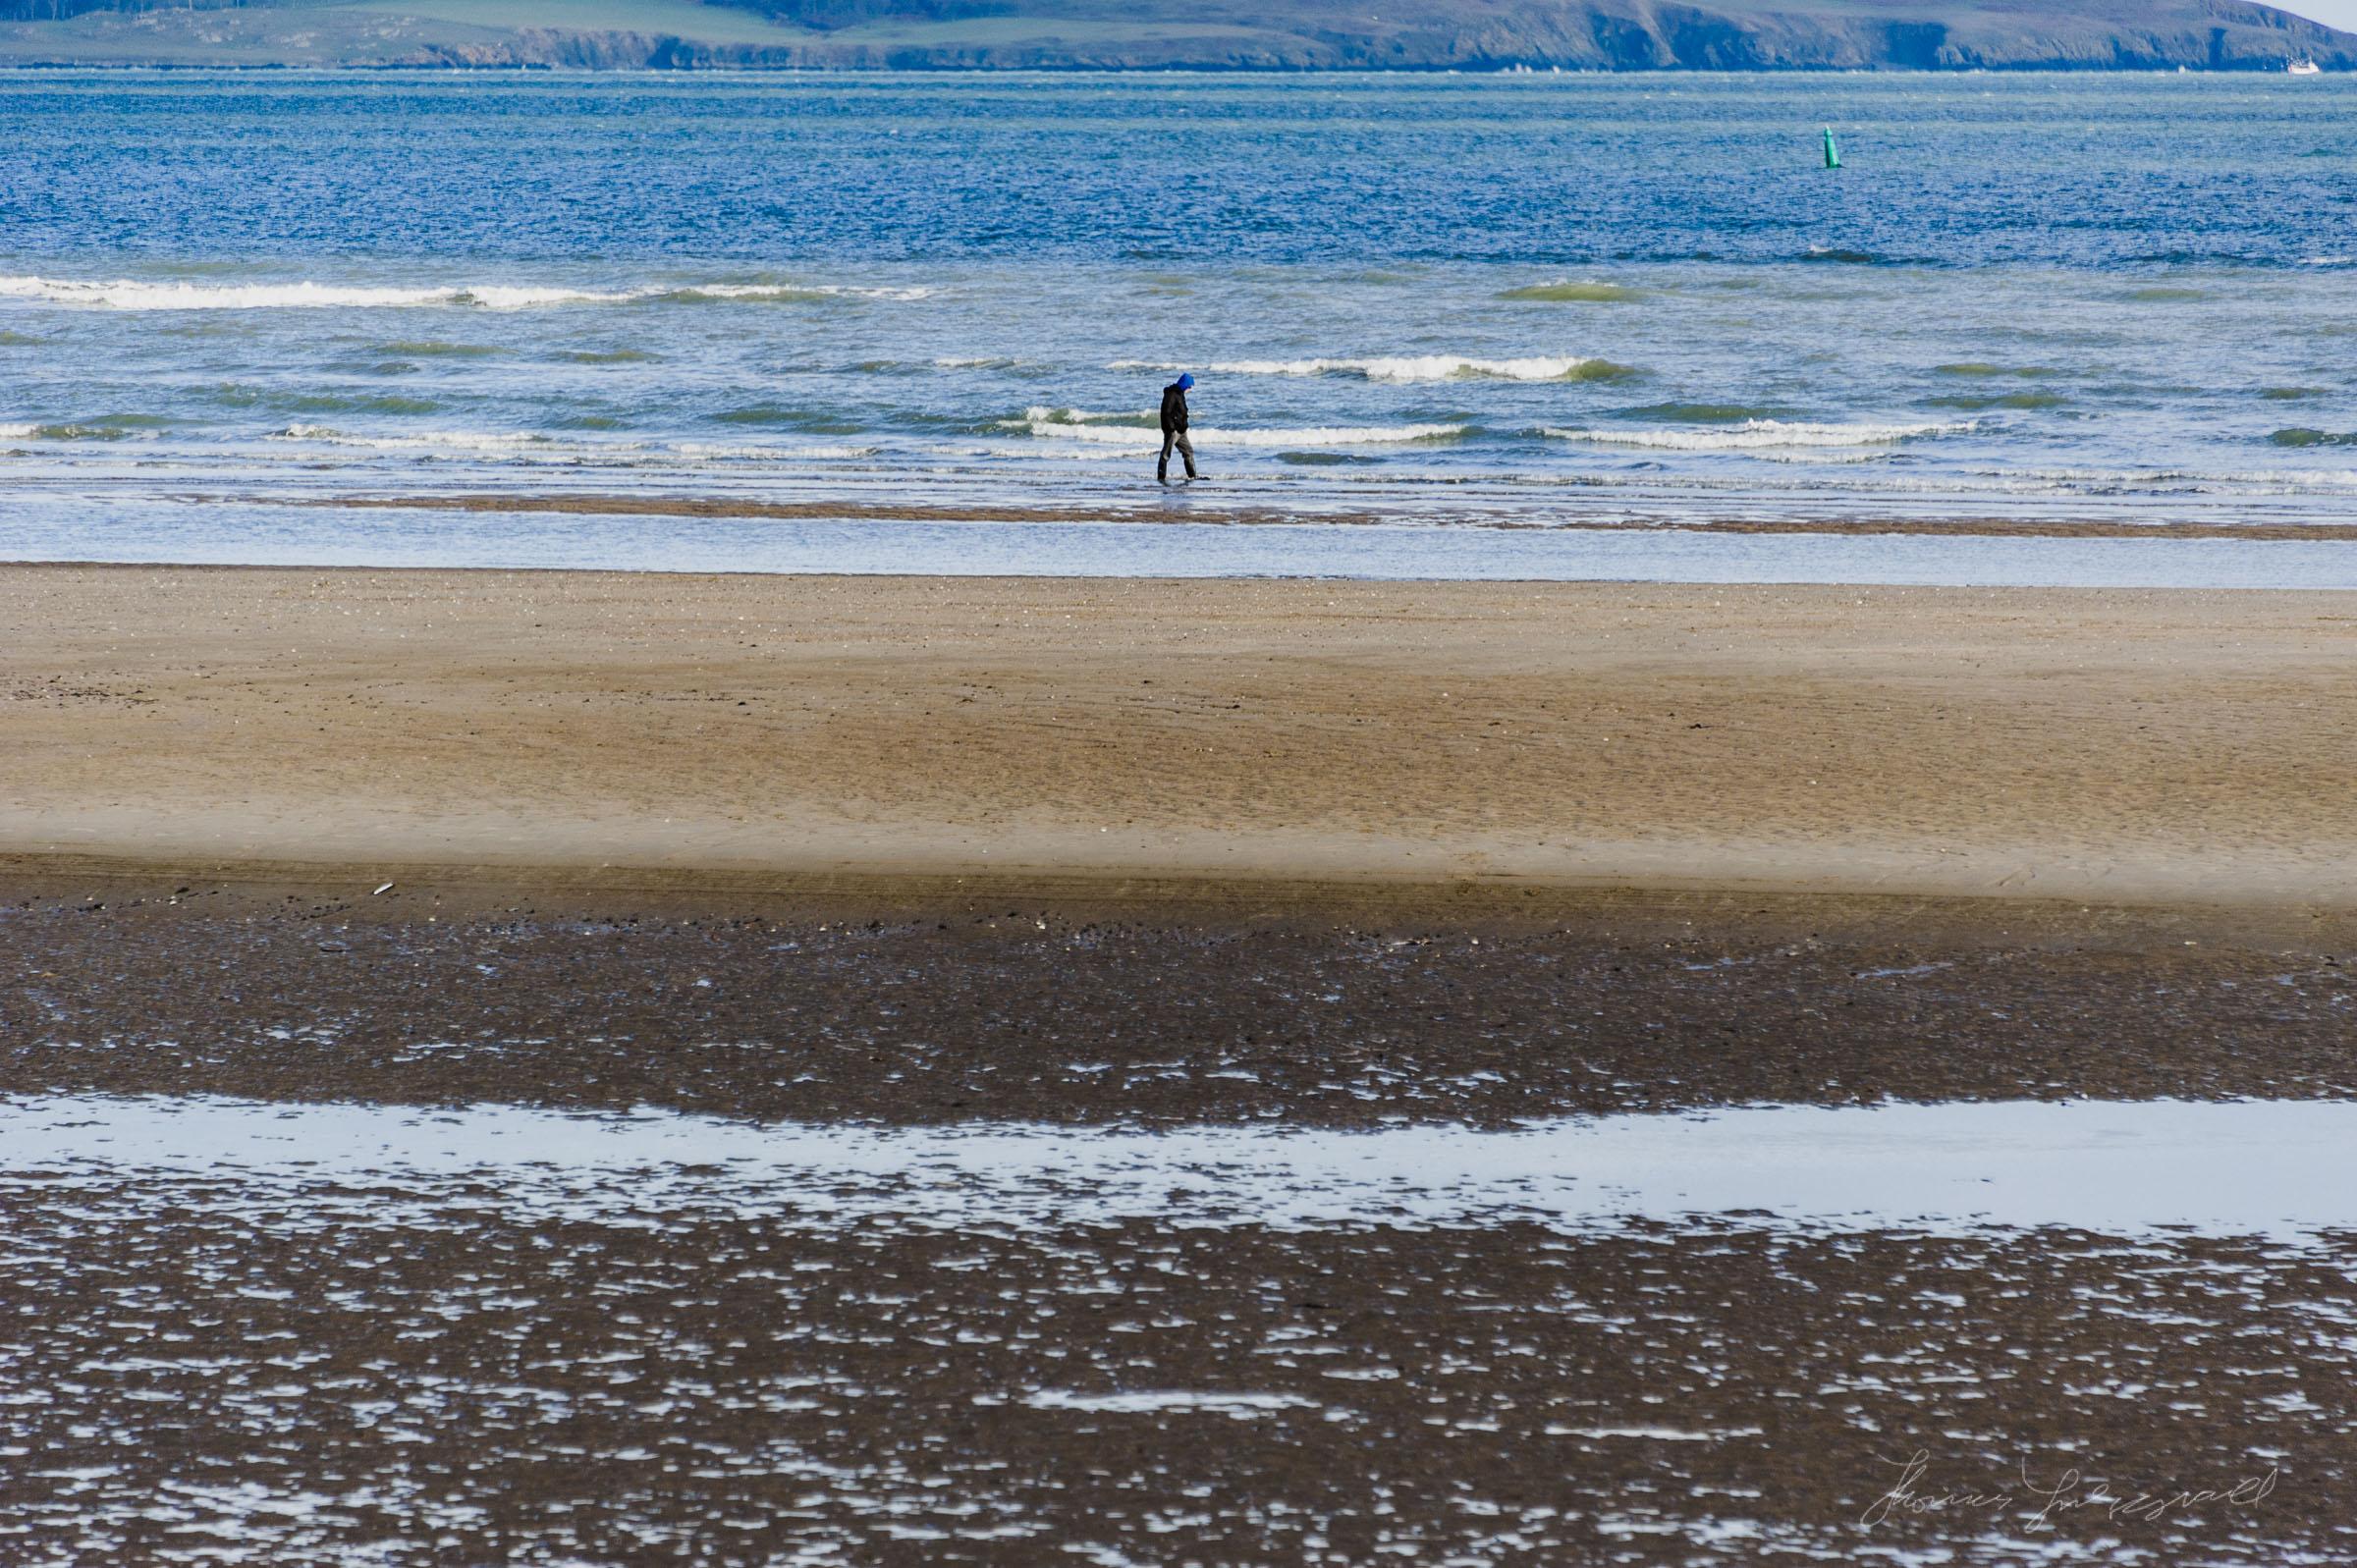 Person walks on the beach at Malahide